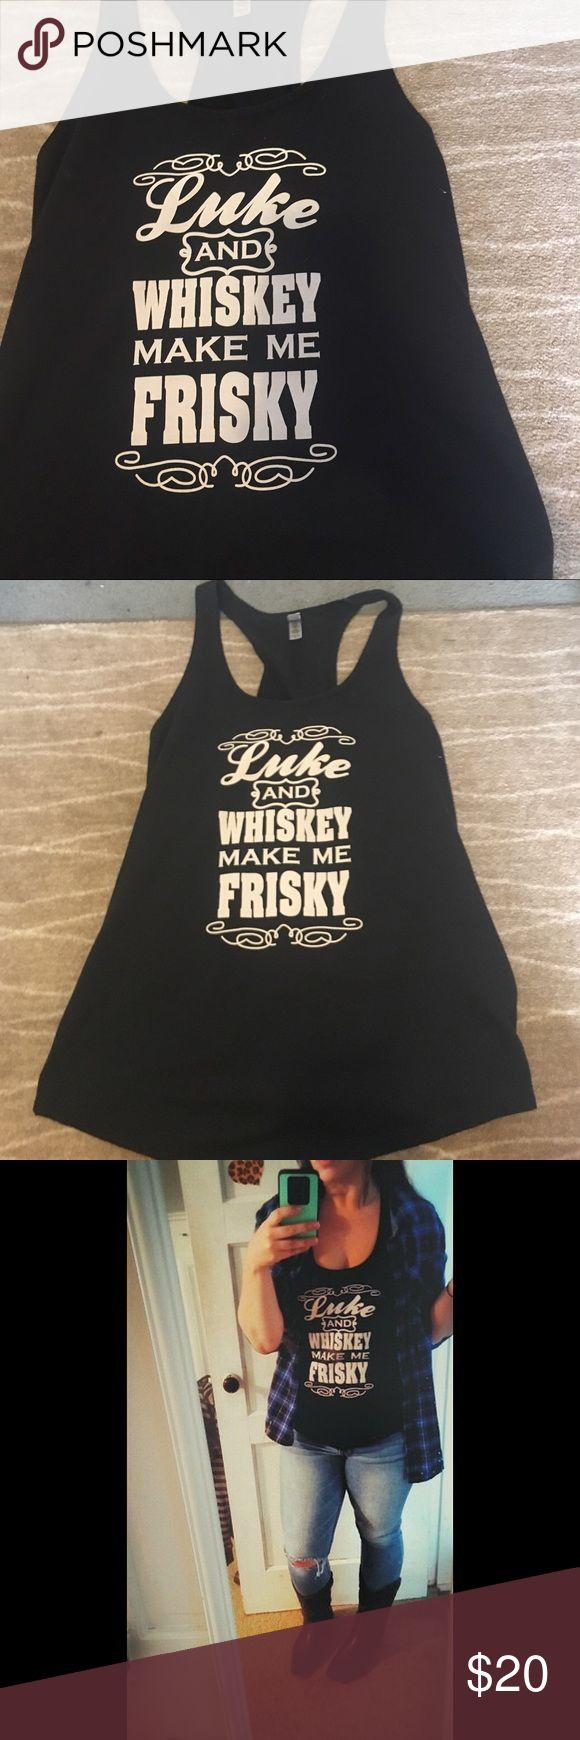 Luke Bryan tank Worn multiple times! Cute shirt for Luke Bryan fans! Tops Tank Tops